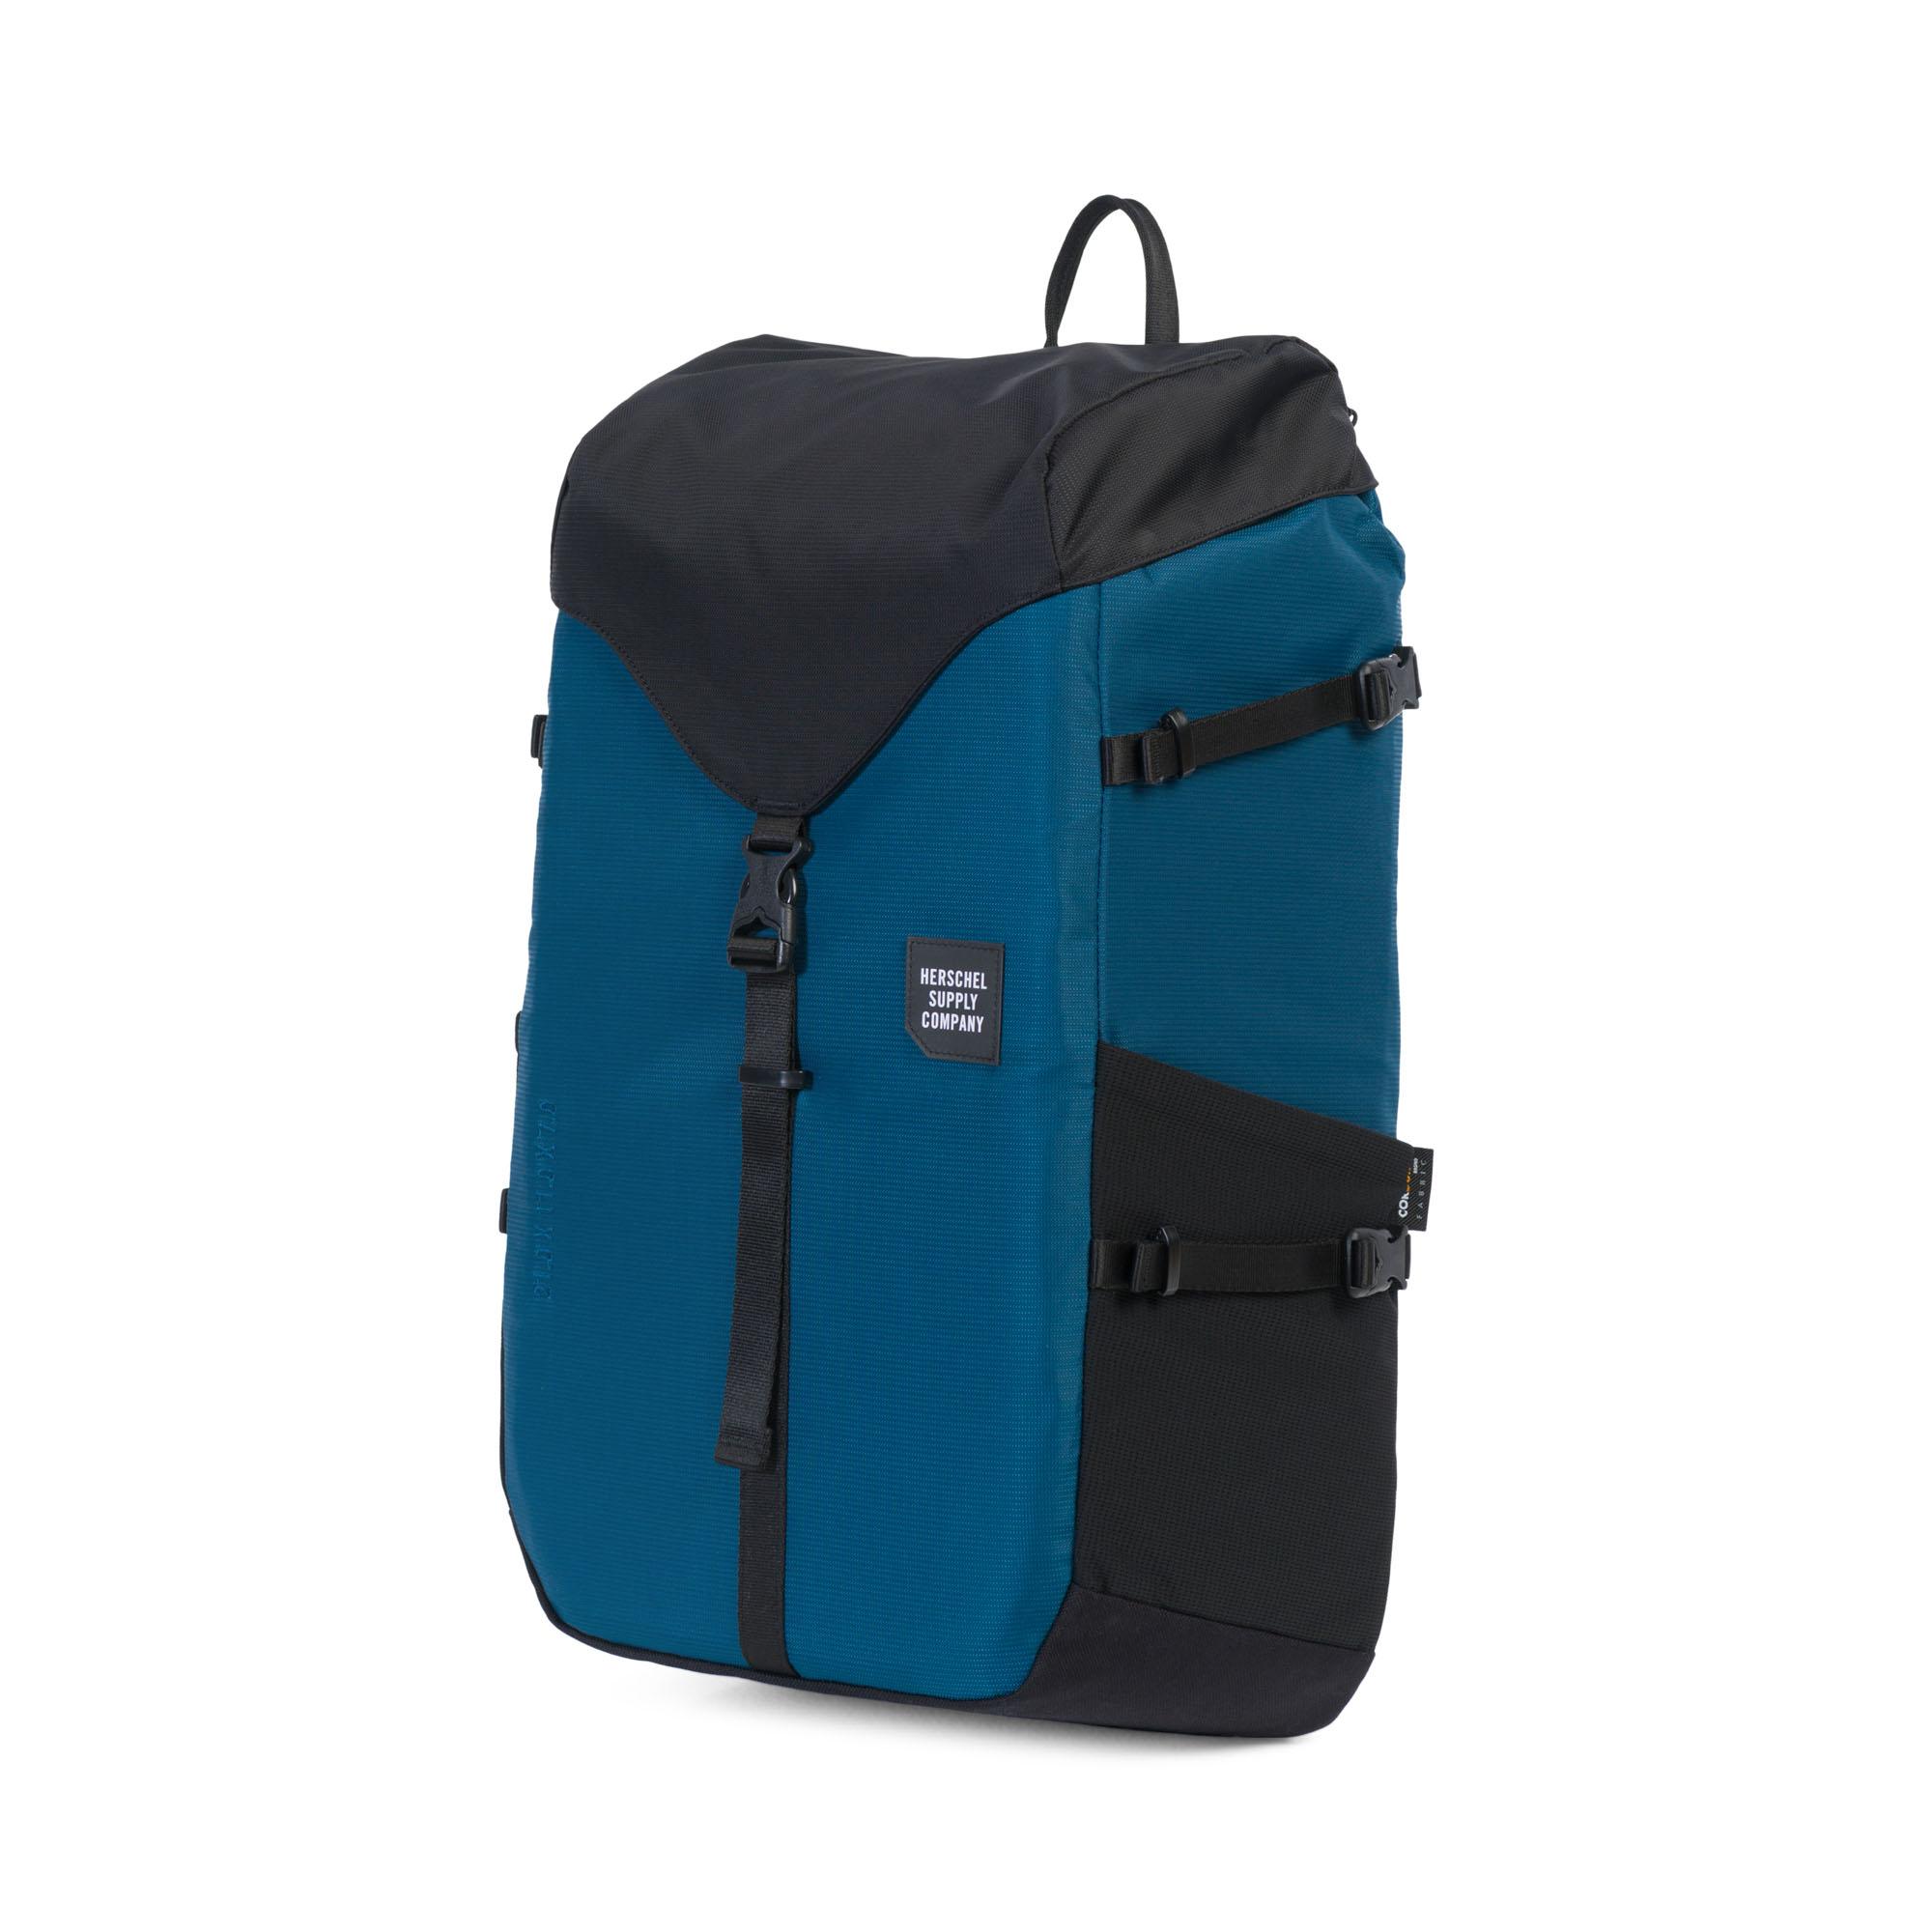 debff74cb35 Barlow Backpack Large